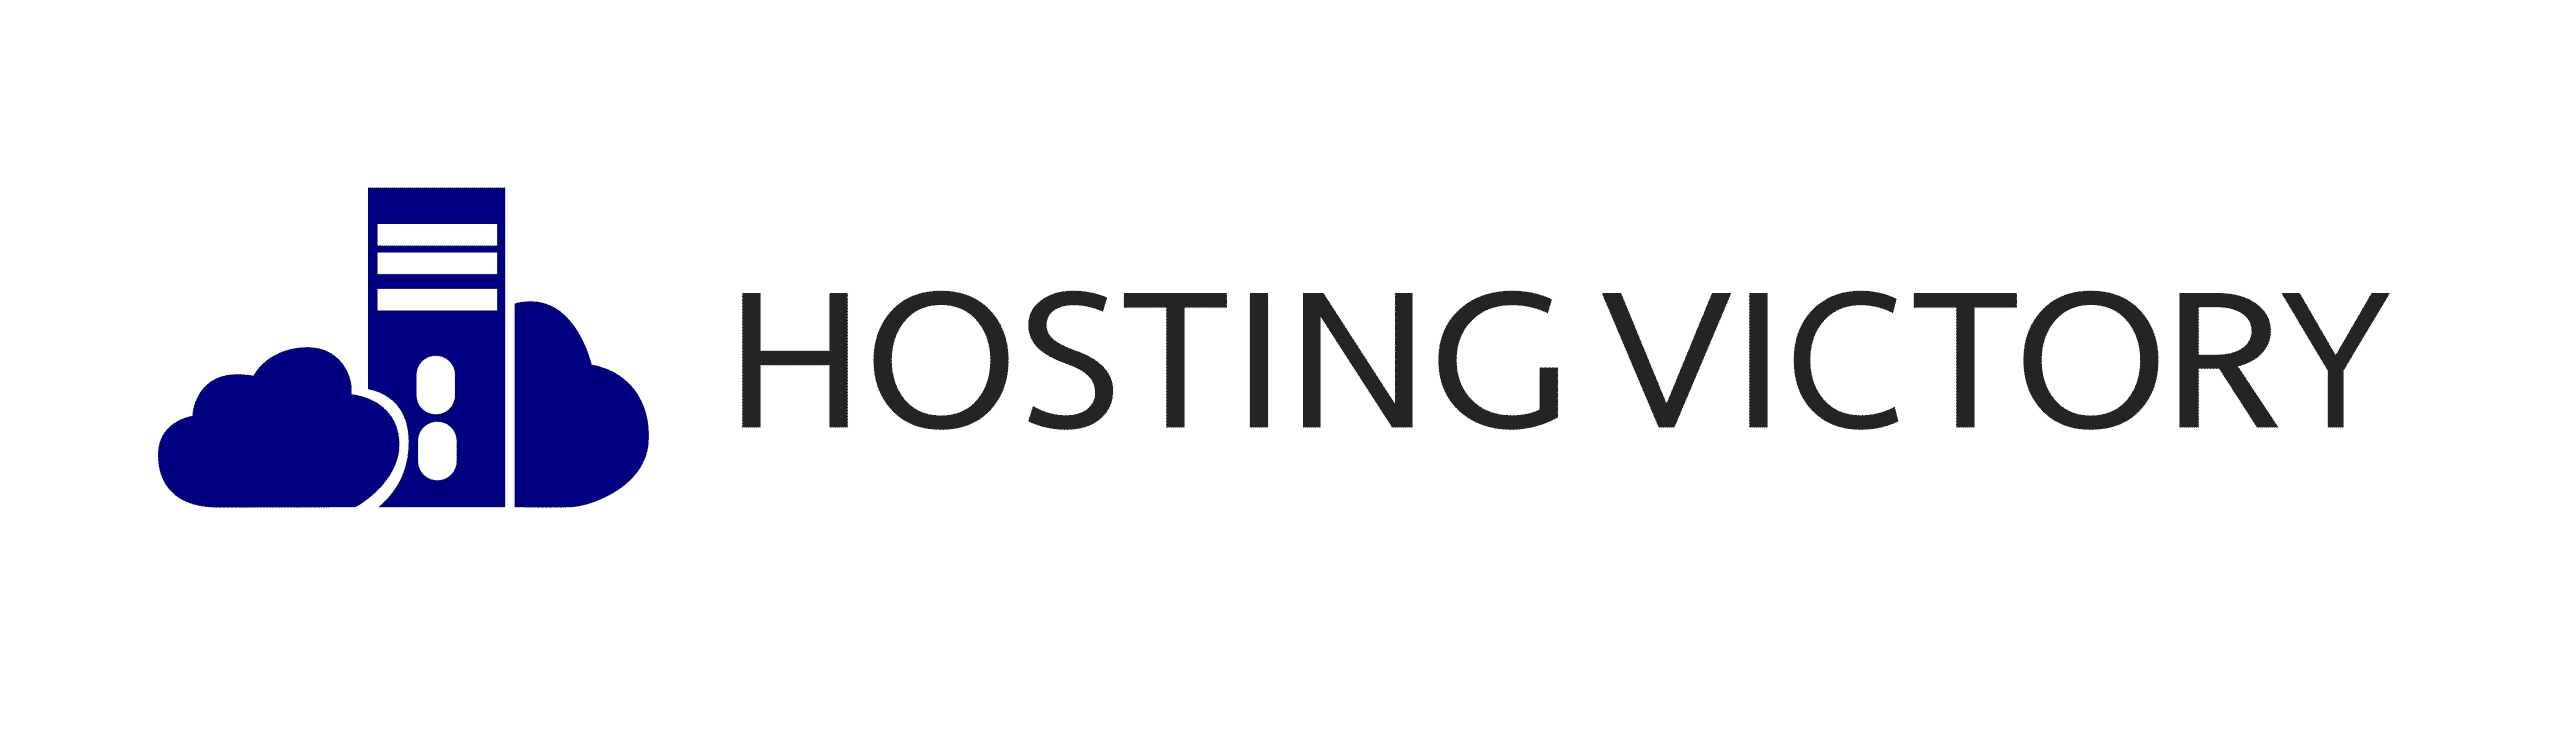 Hosting Victory